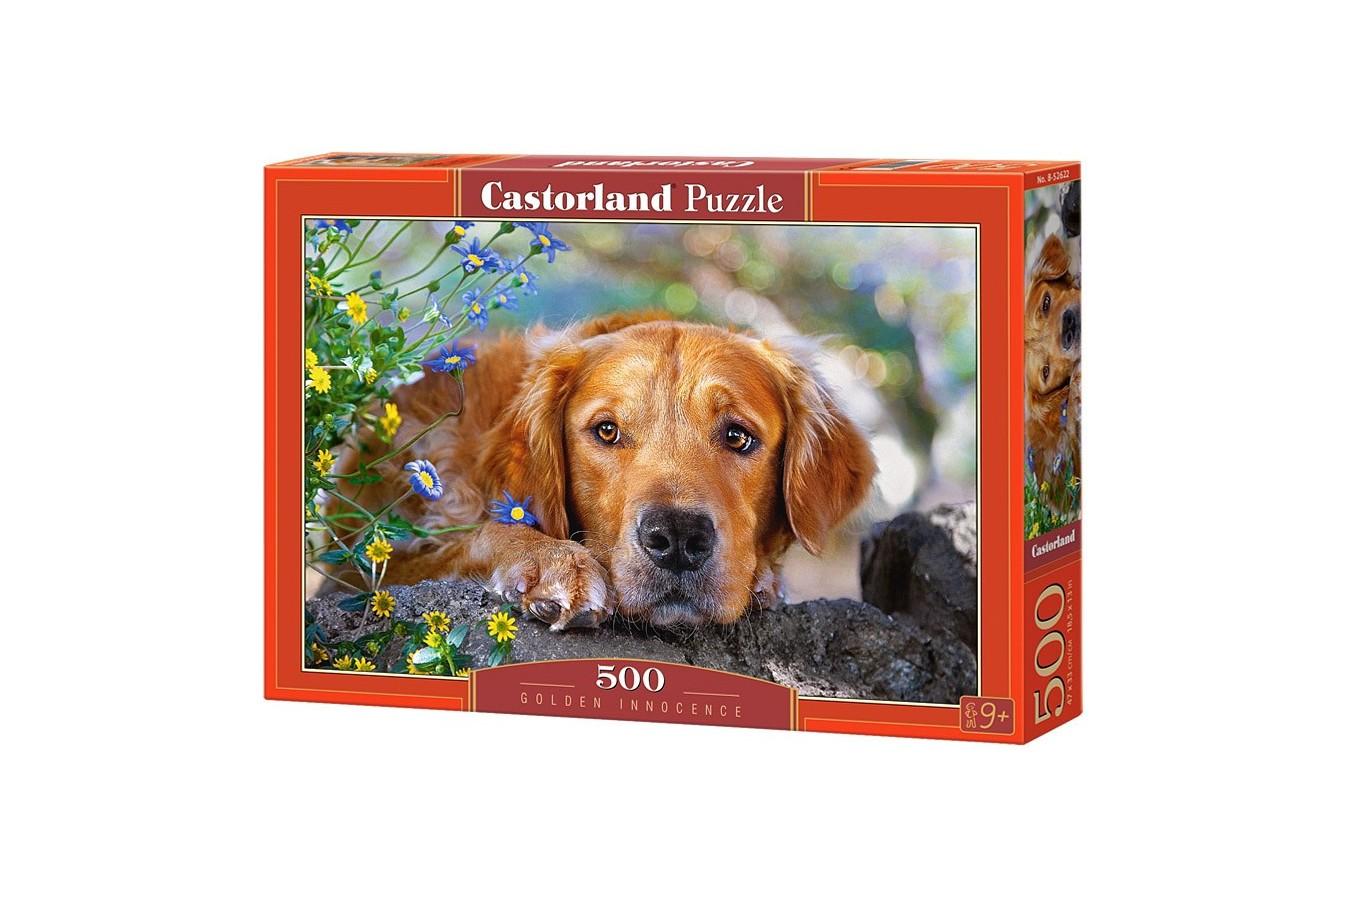 Puzzle Castorland - Golden Innocence, 500 Piese